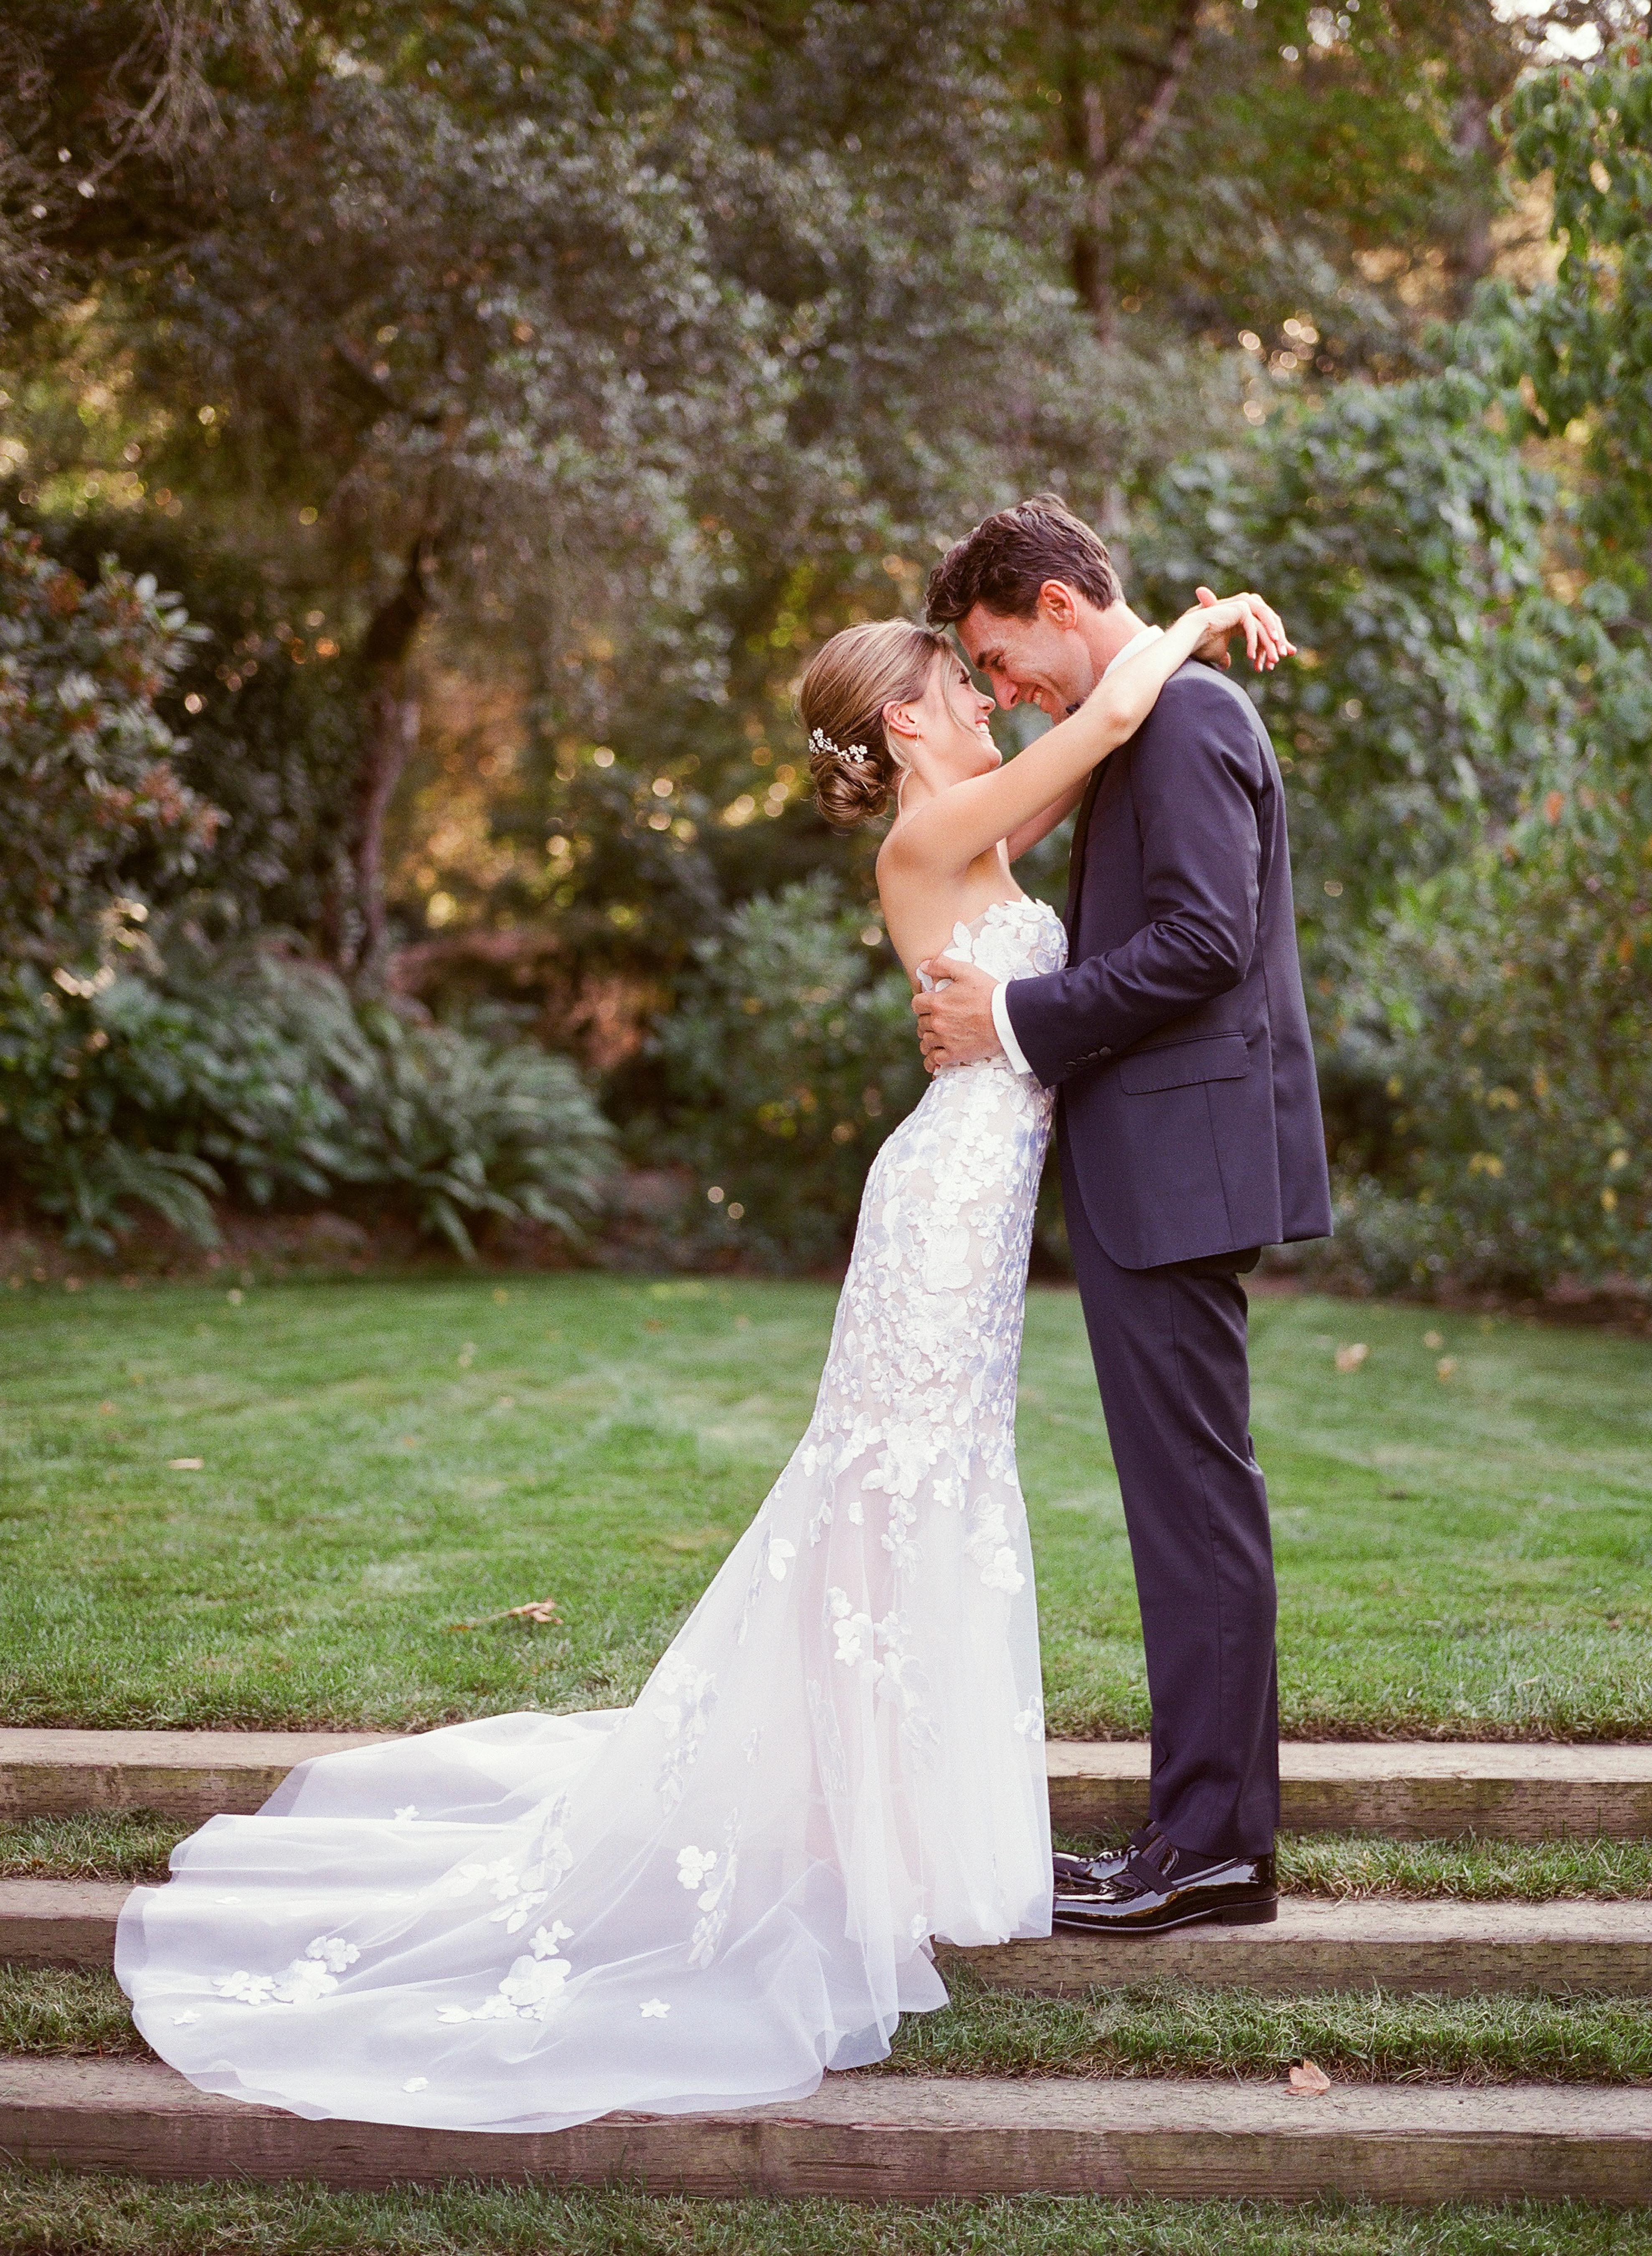 caitlin michael wedding first look